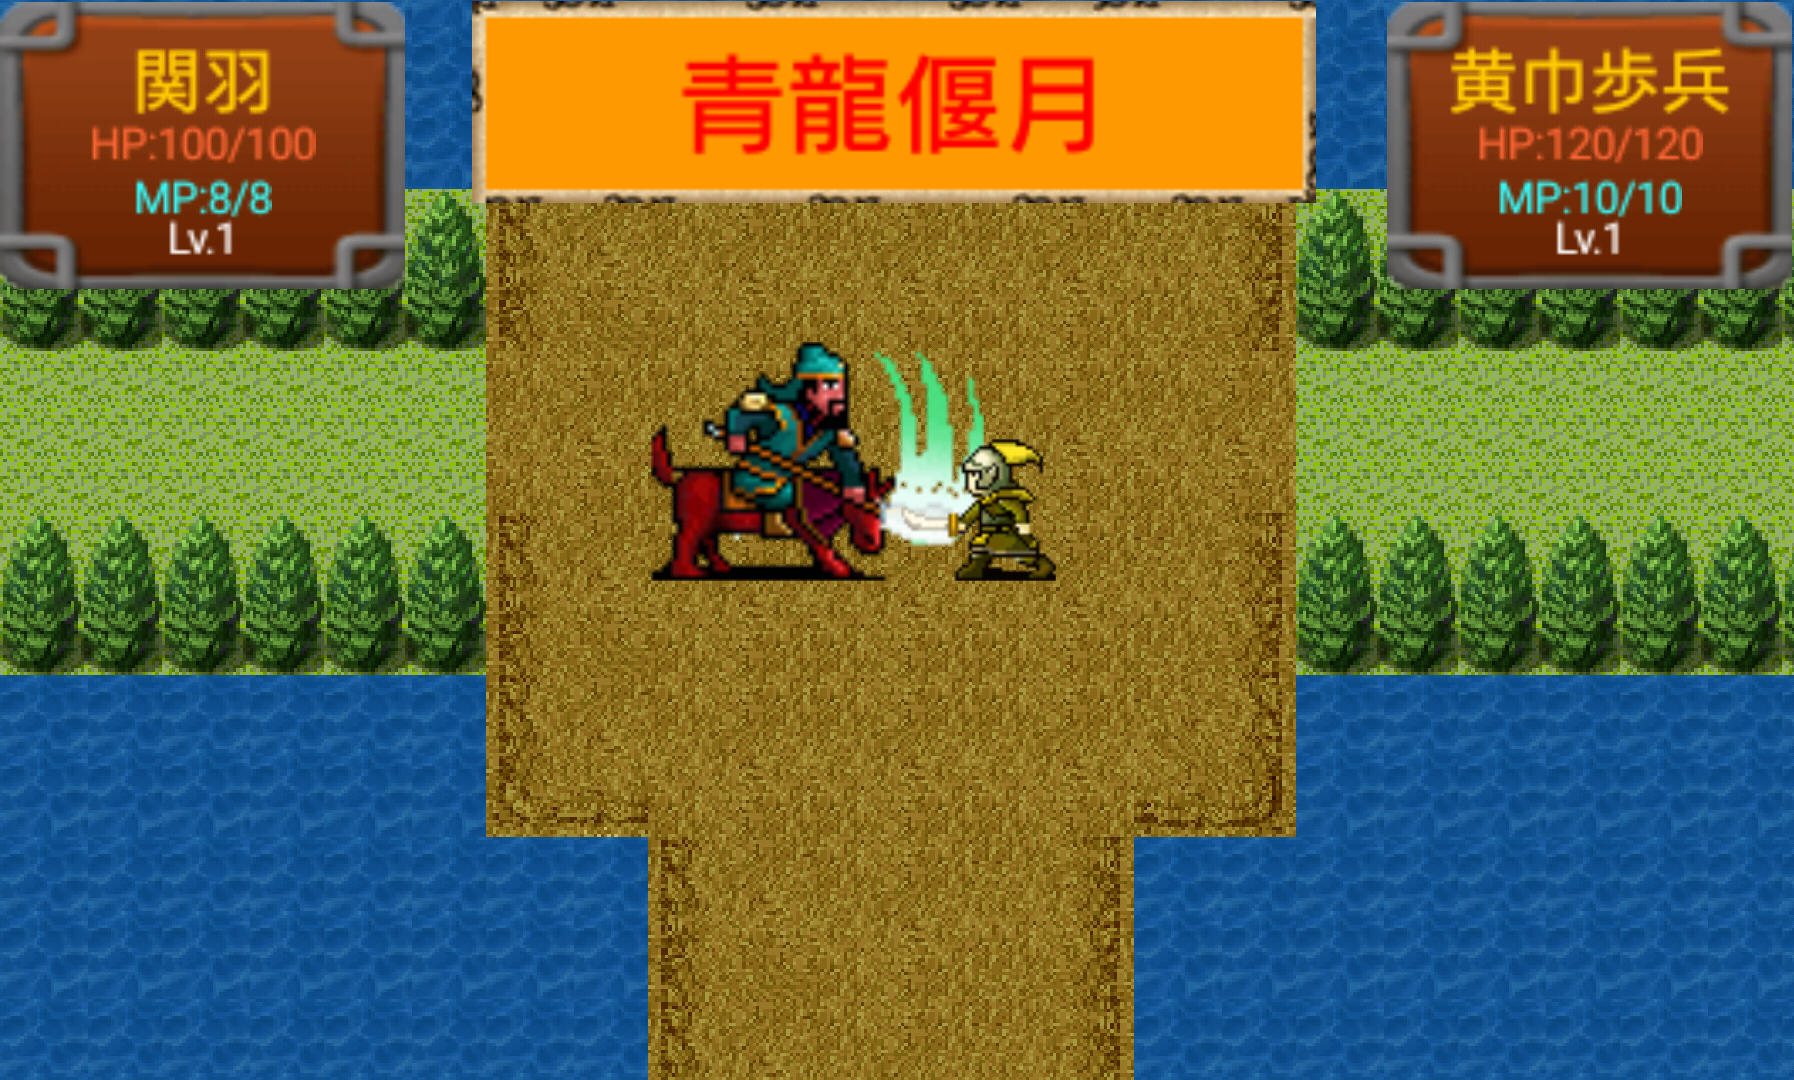 androidアプリ 三国志蜀漢風雲攻略スクリーンショット3